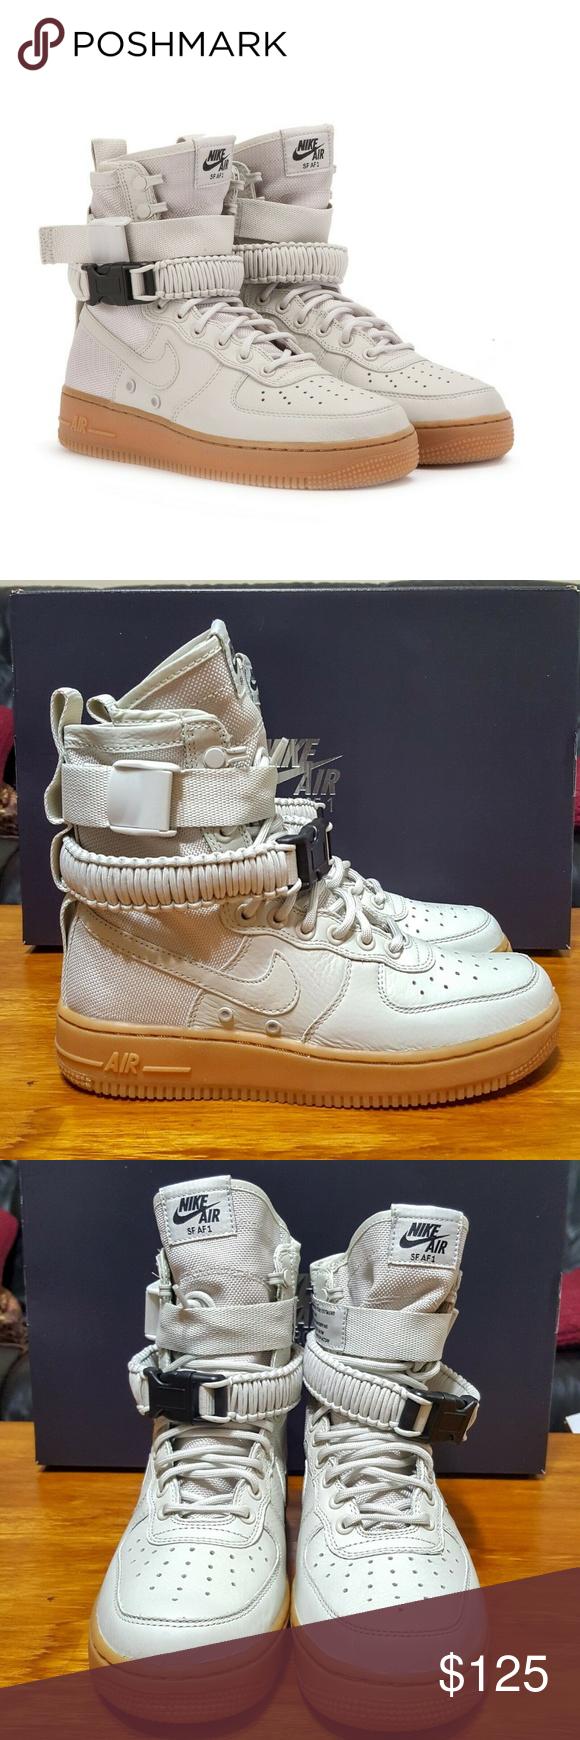 7.5 857872-004 Nike Women SF Air Force 1 Grey Light Bne Gum s